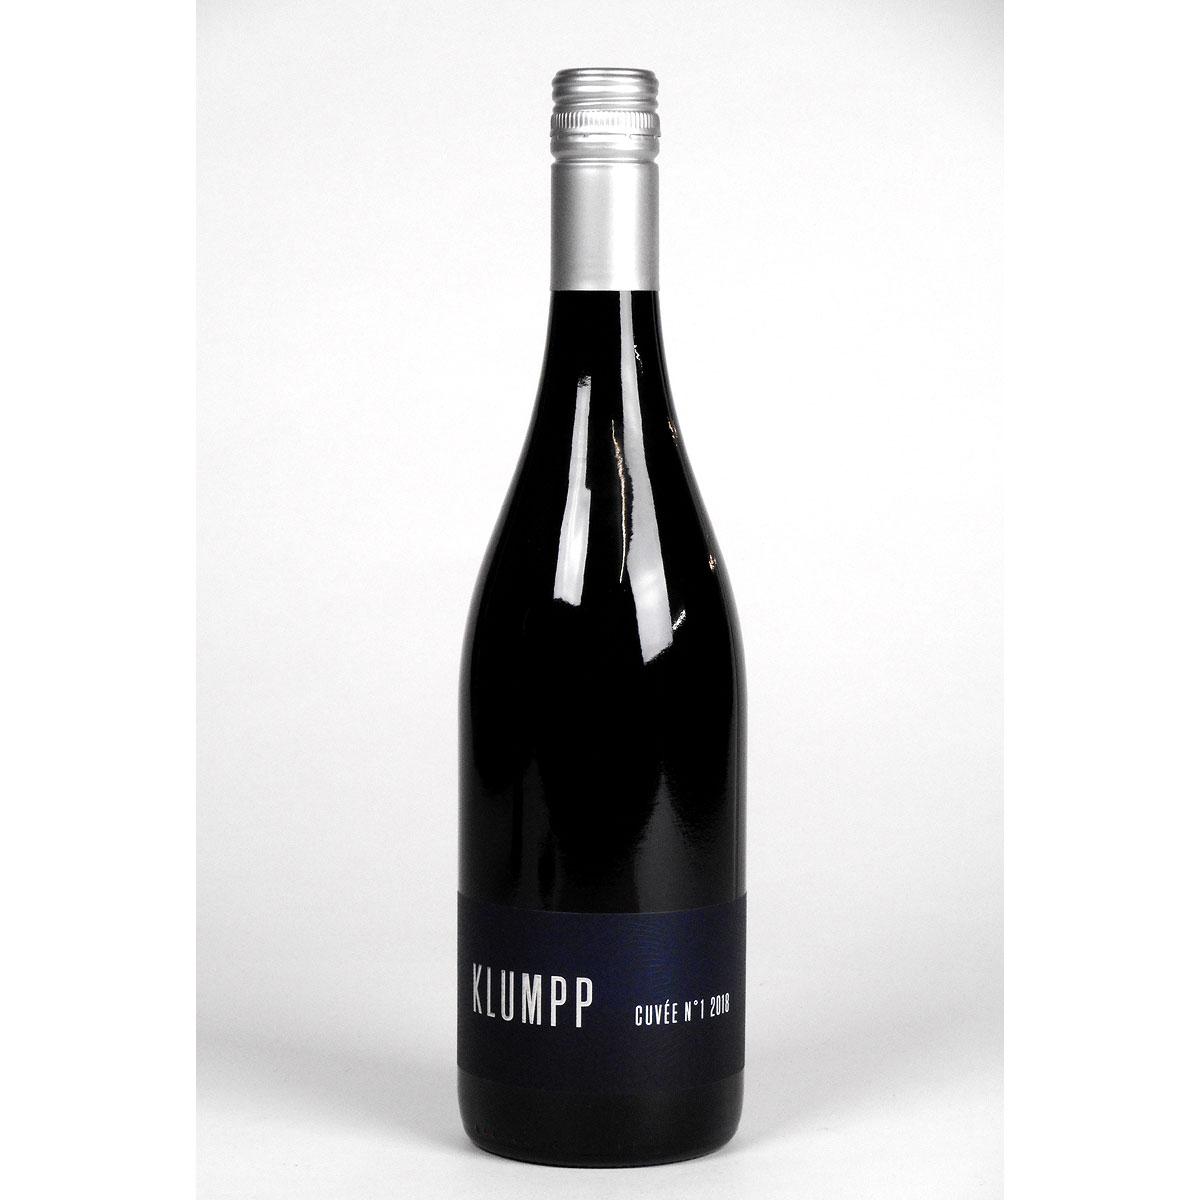 Baden: Klumpp 'Cuvée No. 1' 2018 - Bottle